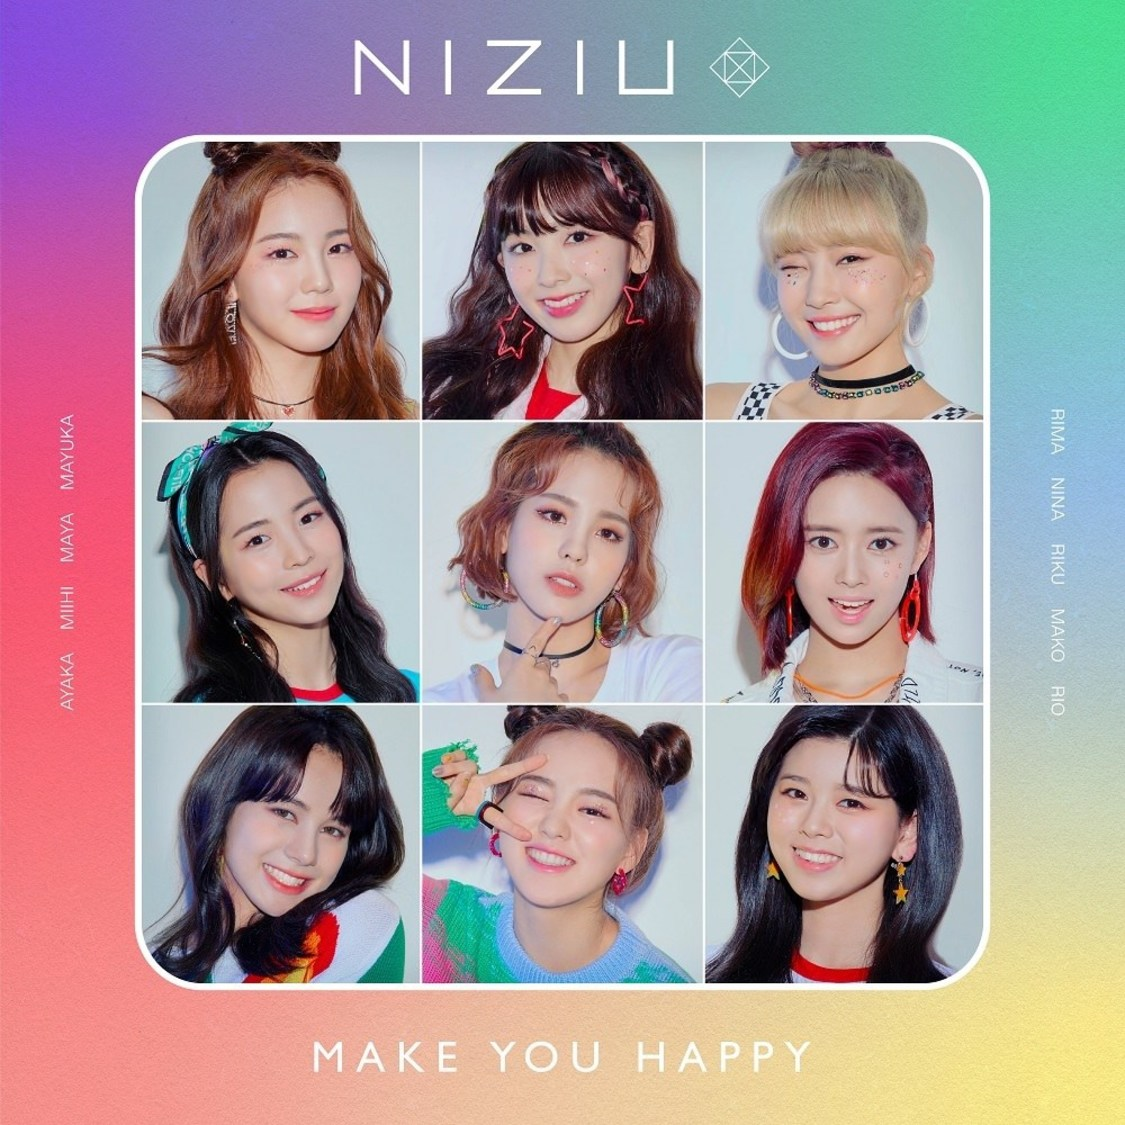 NiziU、「Make you happy」がレコ協ストリーミングプラチナ(1億回再生以上)認定に